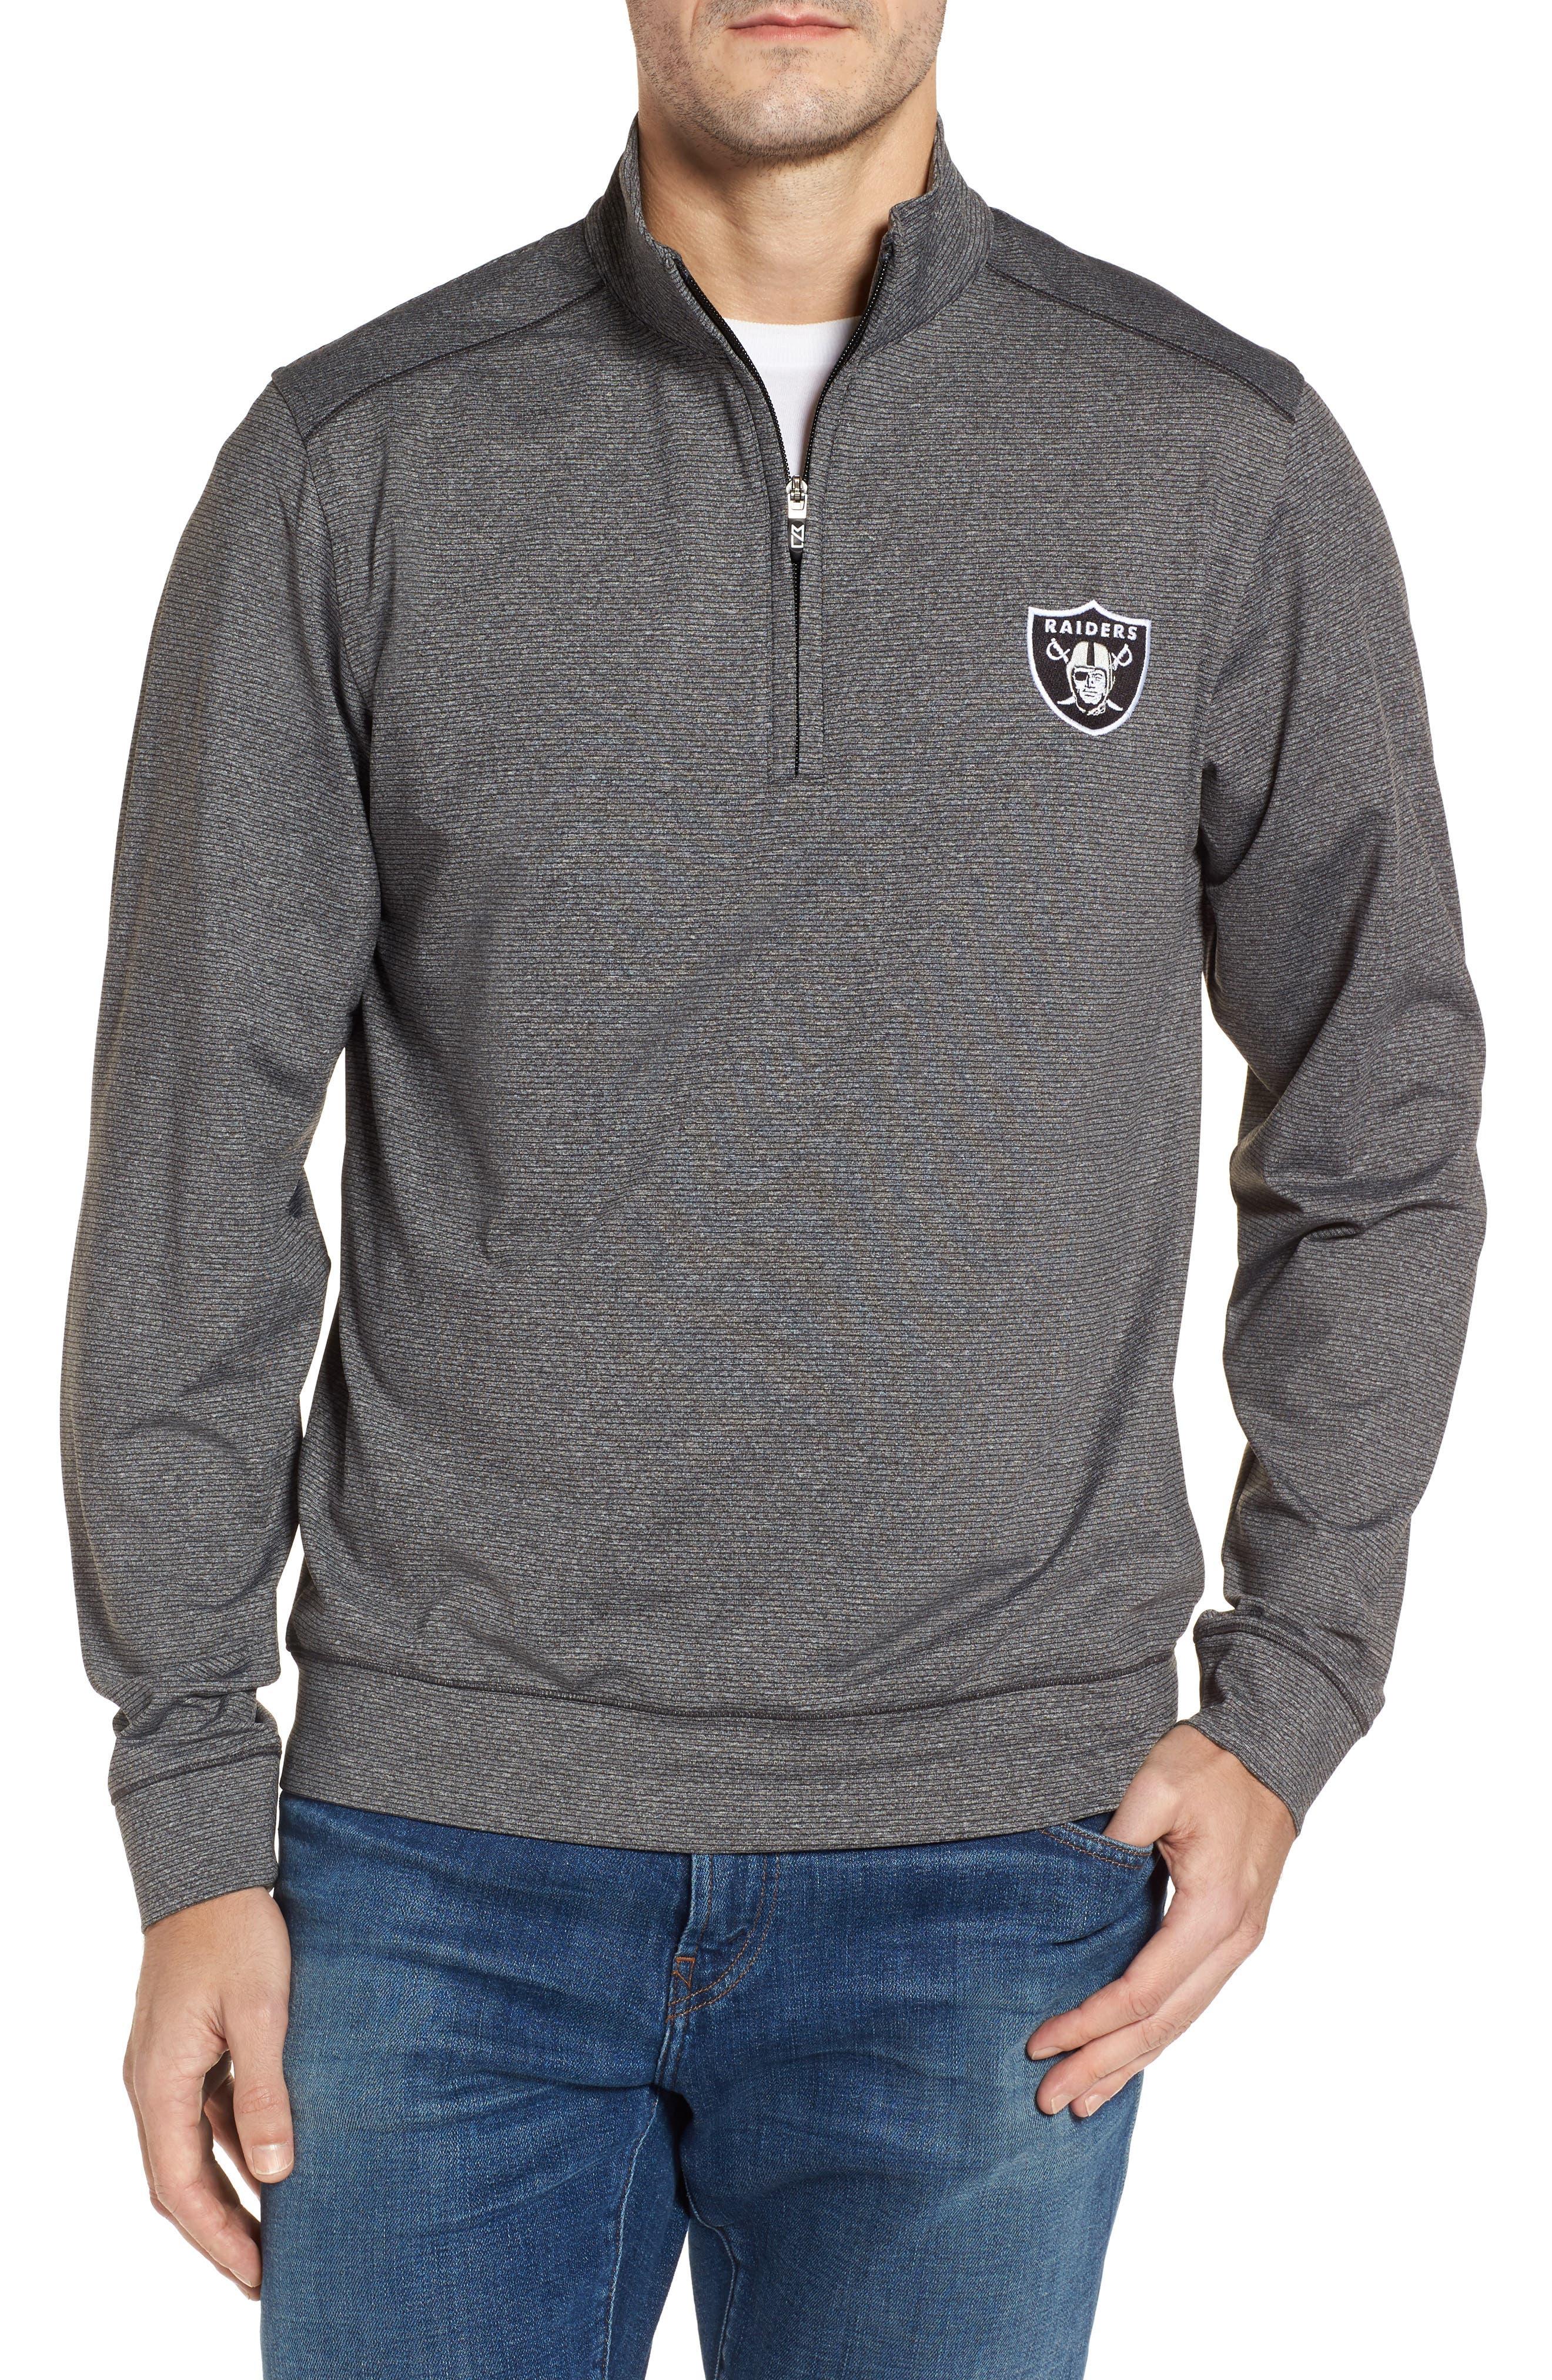 Shoreline - Oakland Raiders Half Zip Pullover,                             Main thumbnail 1, color,                             Charcoal Heather